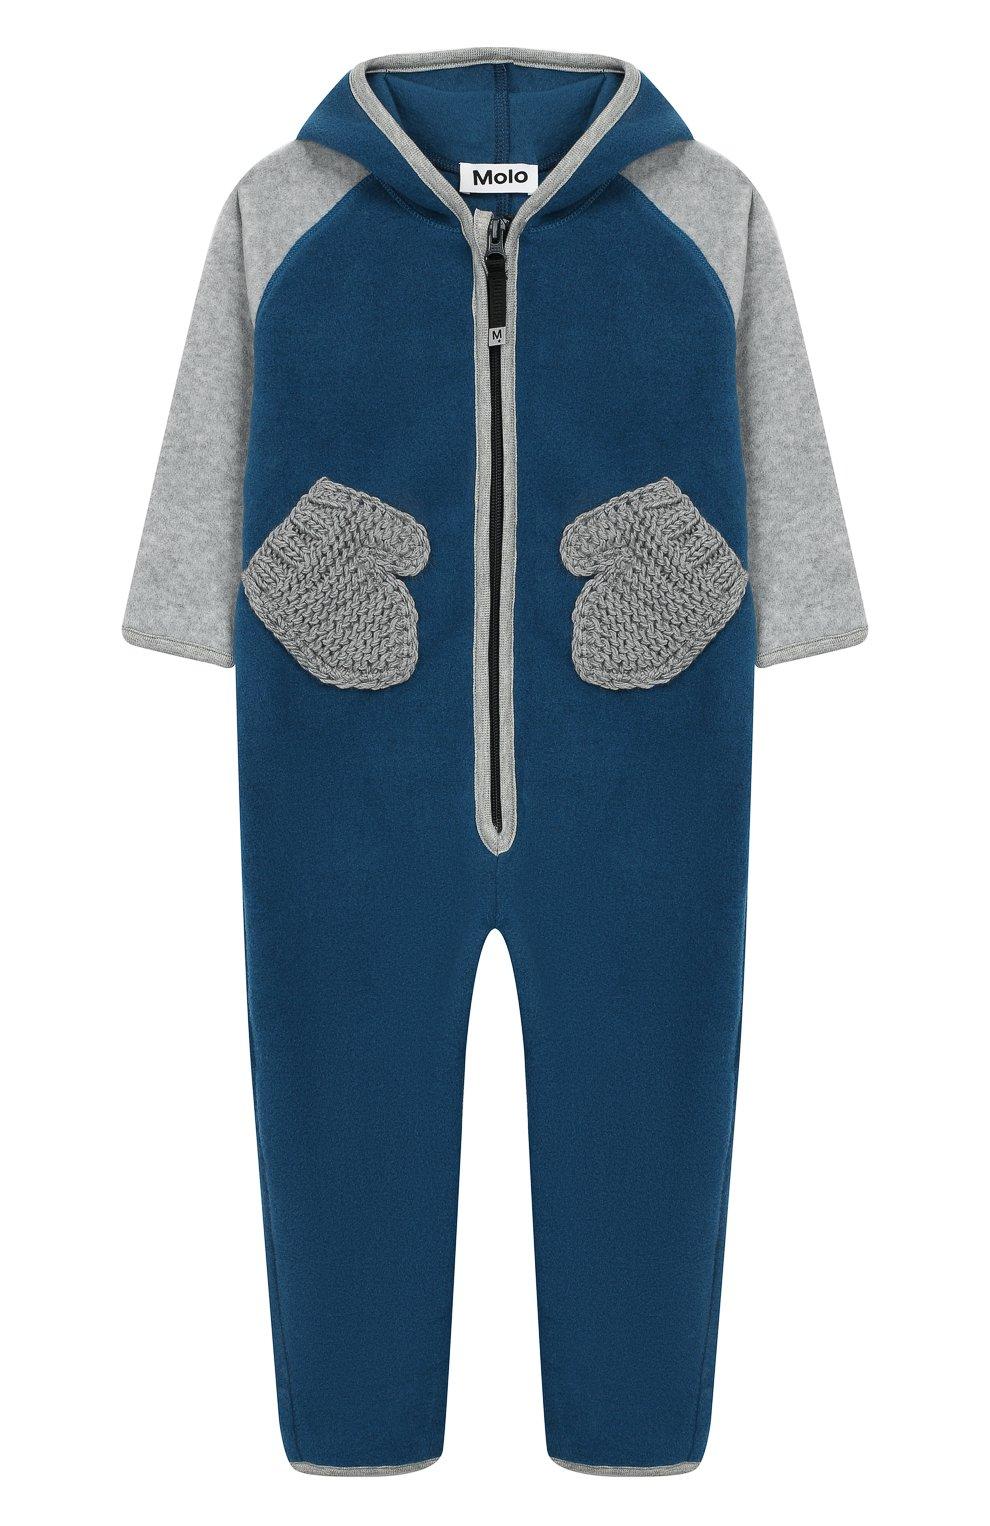 Детский комбинезон MOLO синего цвета, арт. 5W19L301 | Фото 1